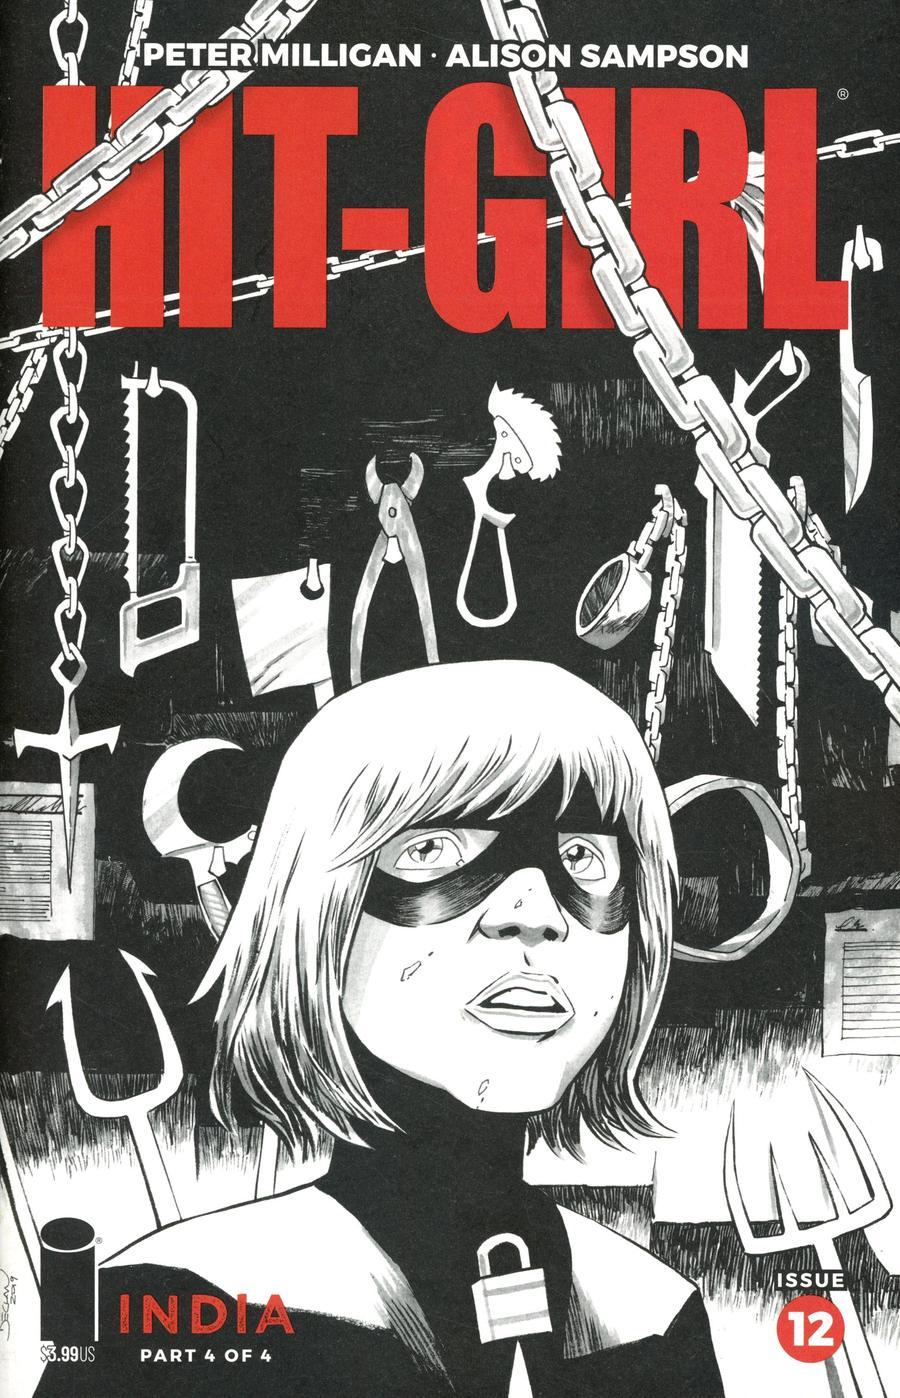 Hit-Girl Vol 2 Season 2 #12 Cover B Variant Declan Shalvey Sketch Cover